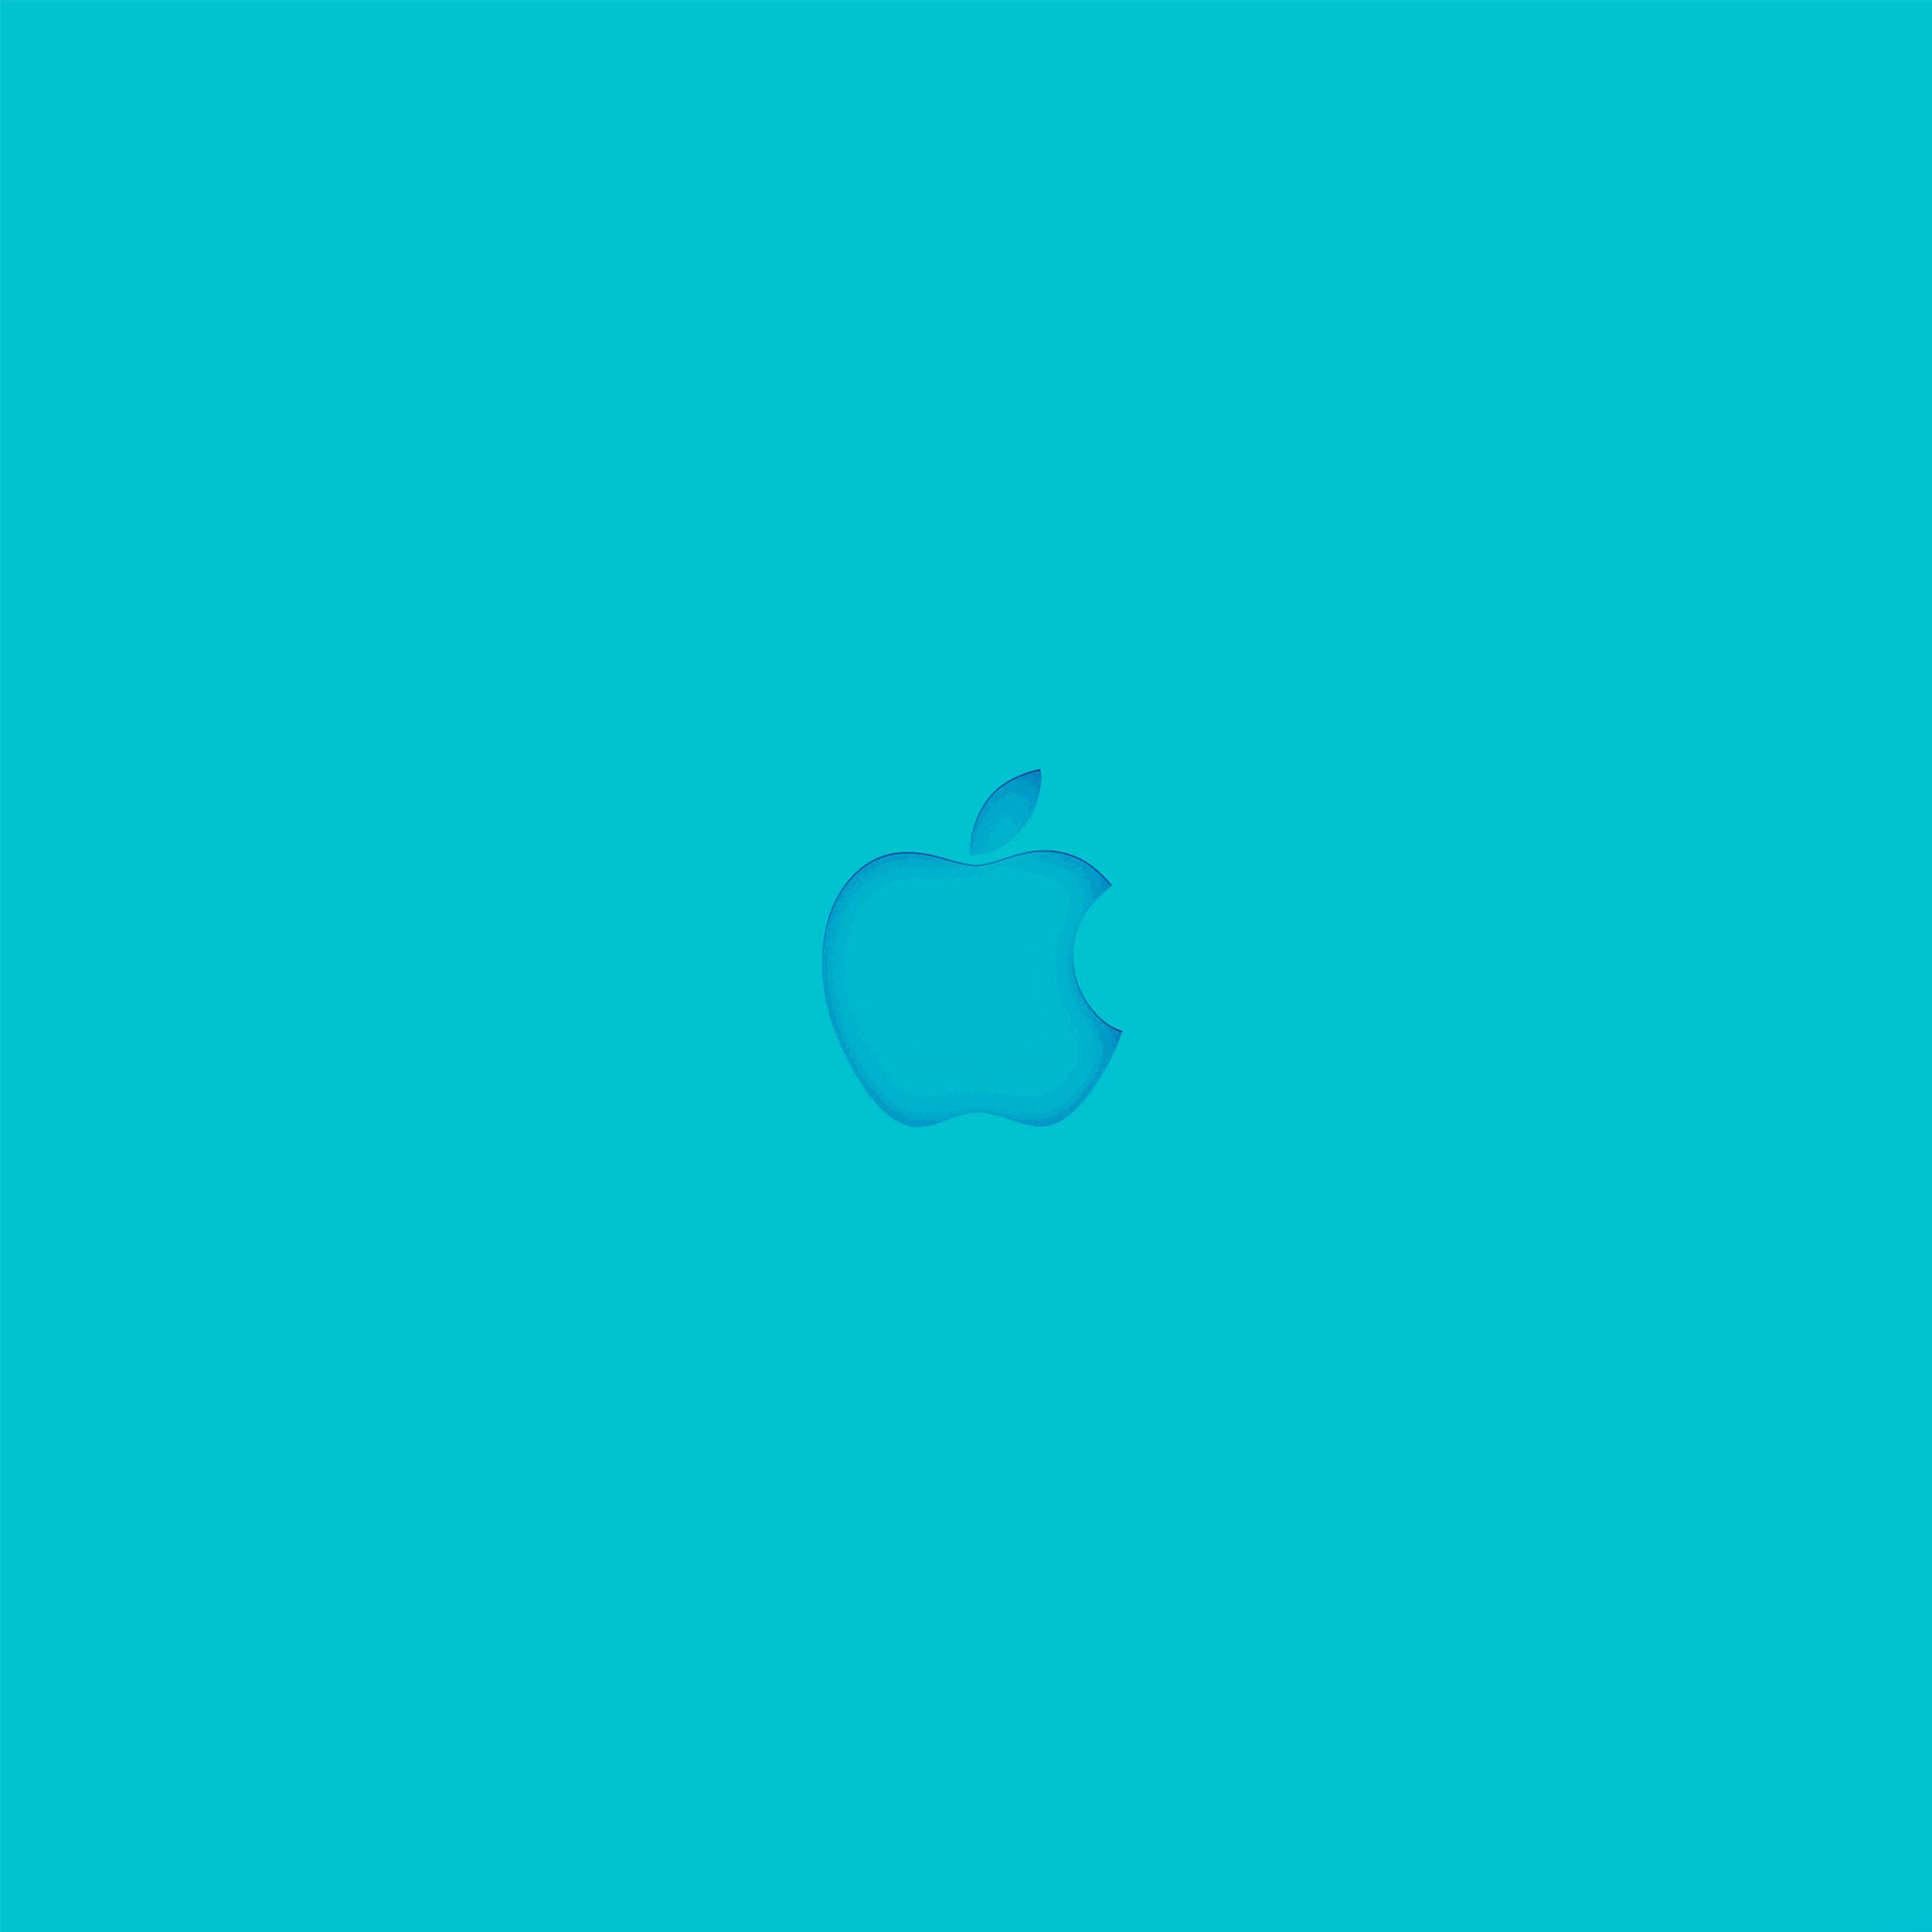 iPad ProApple Logo 2732x2732